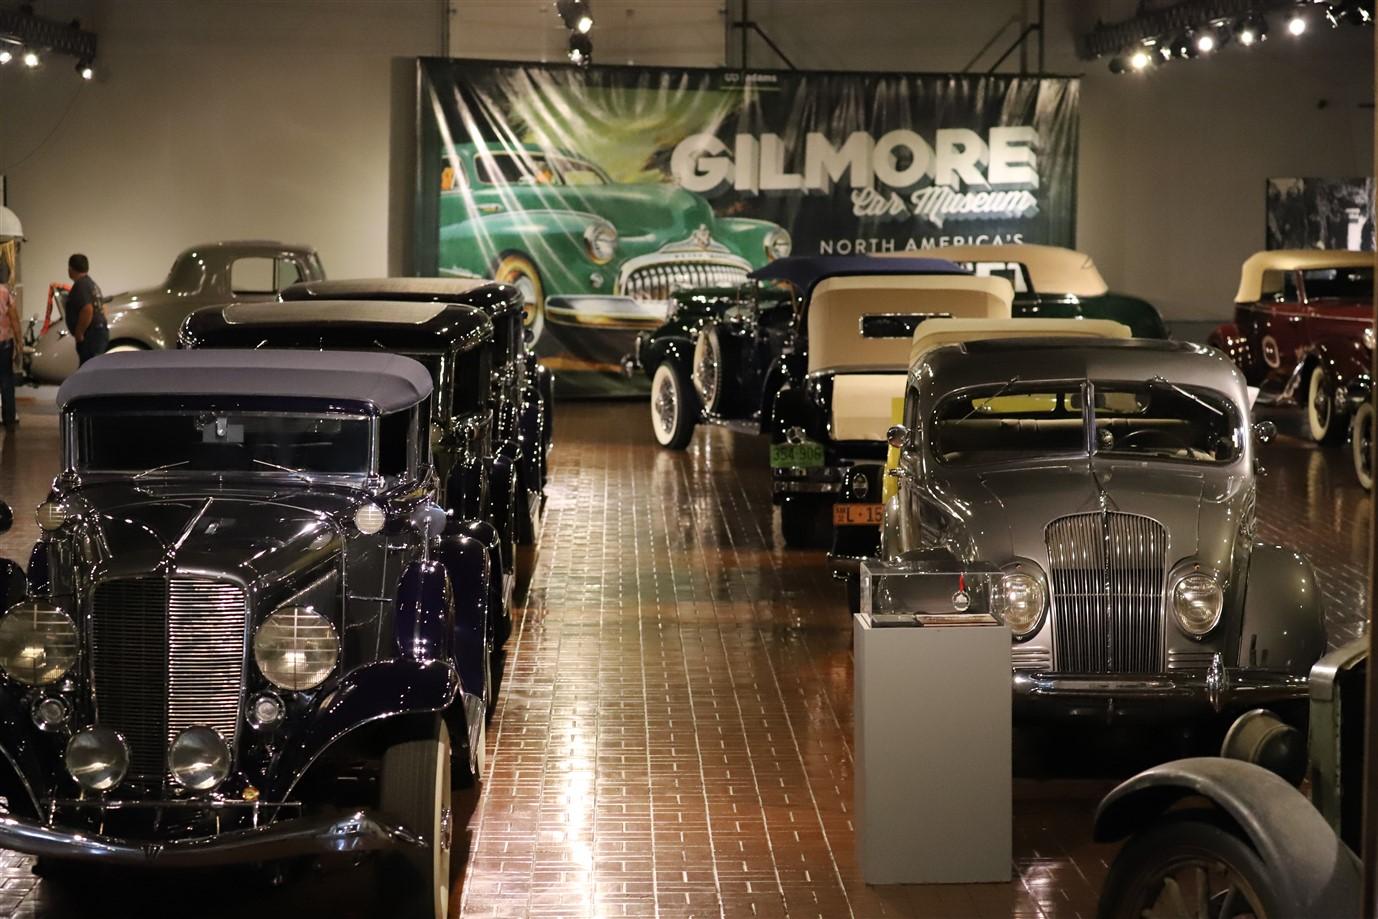 2018 09 03 510 Hickory Corners MI Gilmore Car Museum.jpg